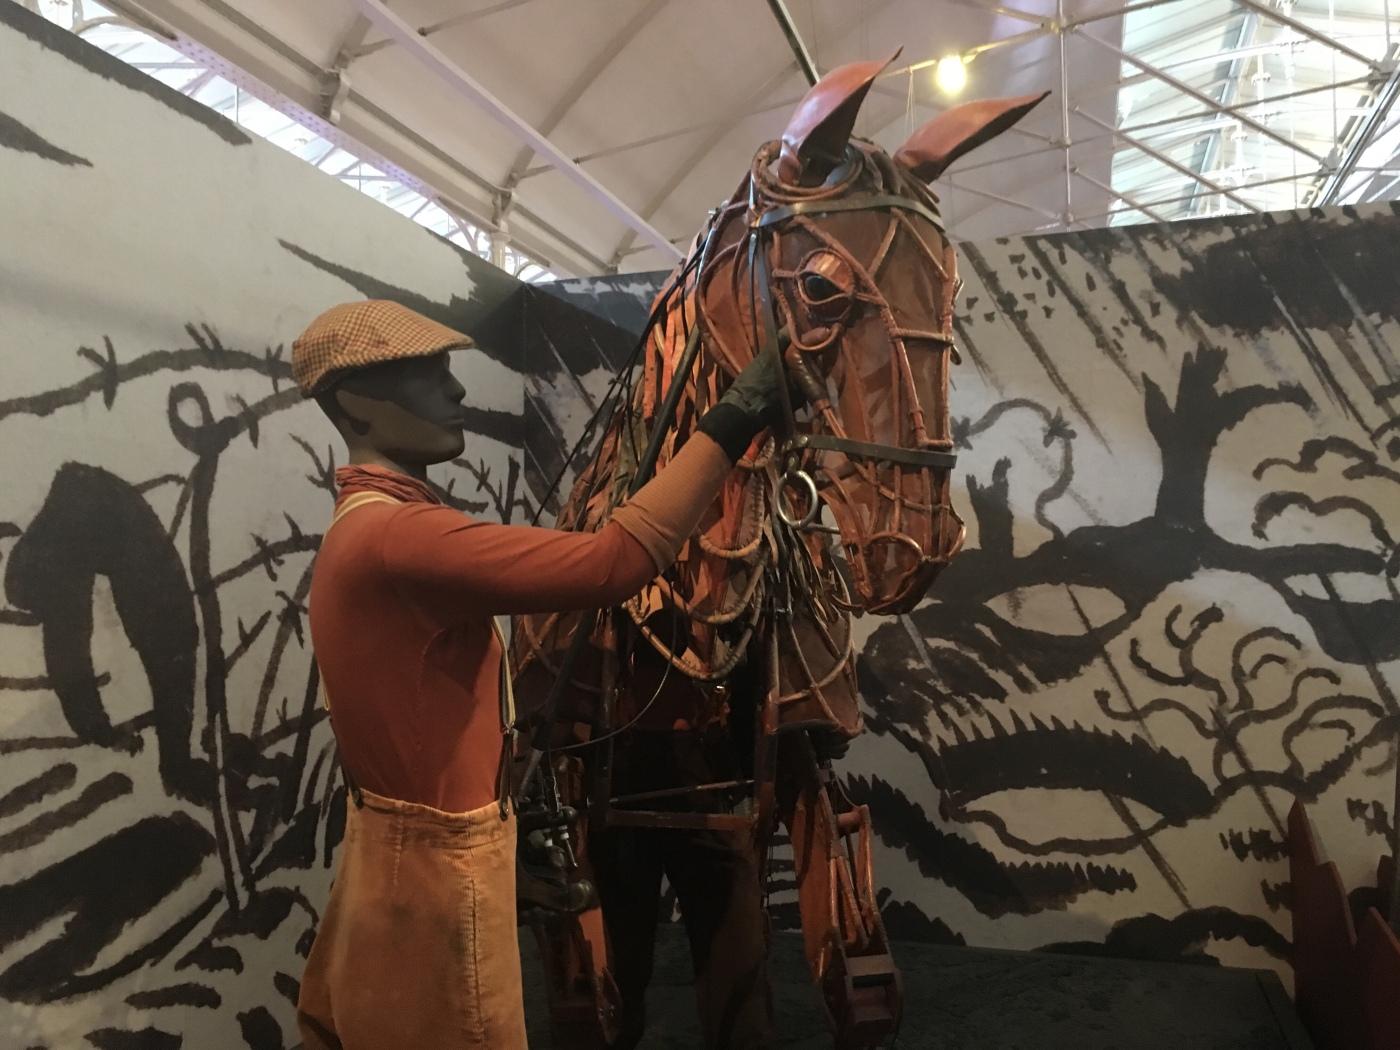 Puppet of Joey from War Horse